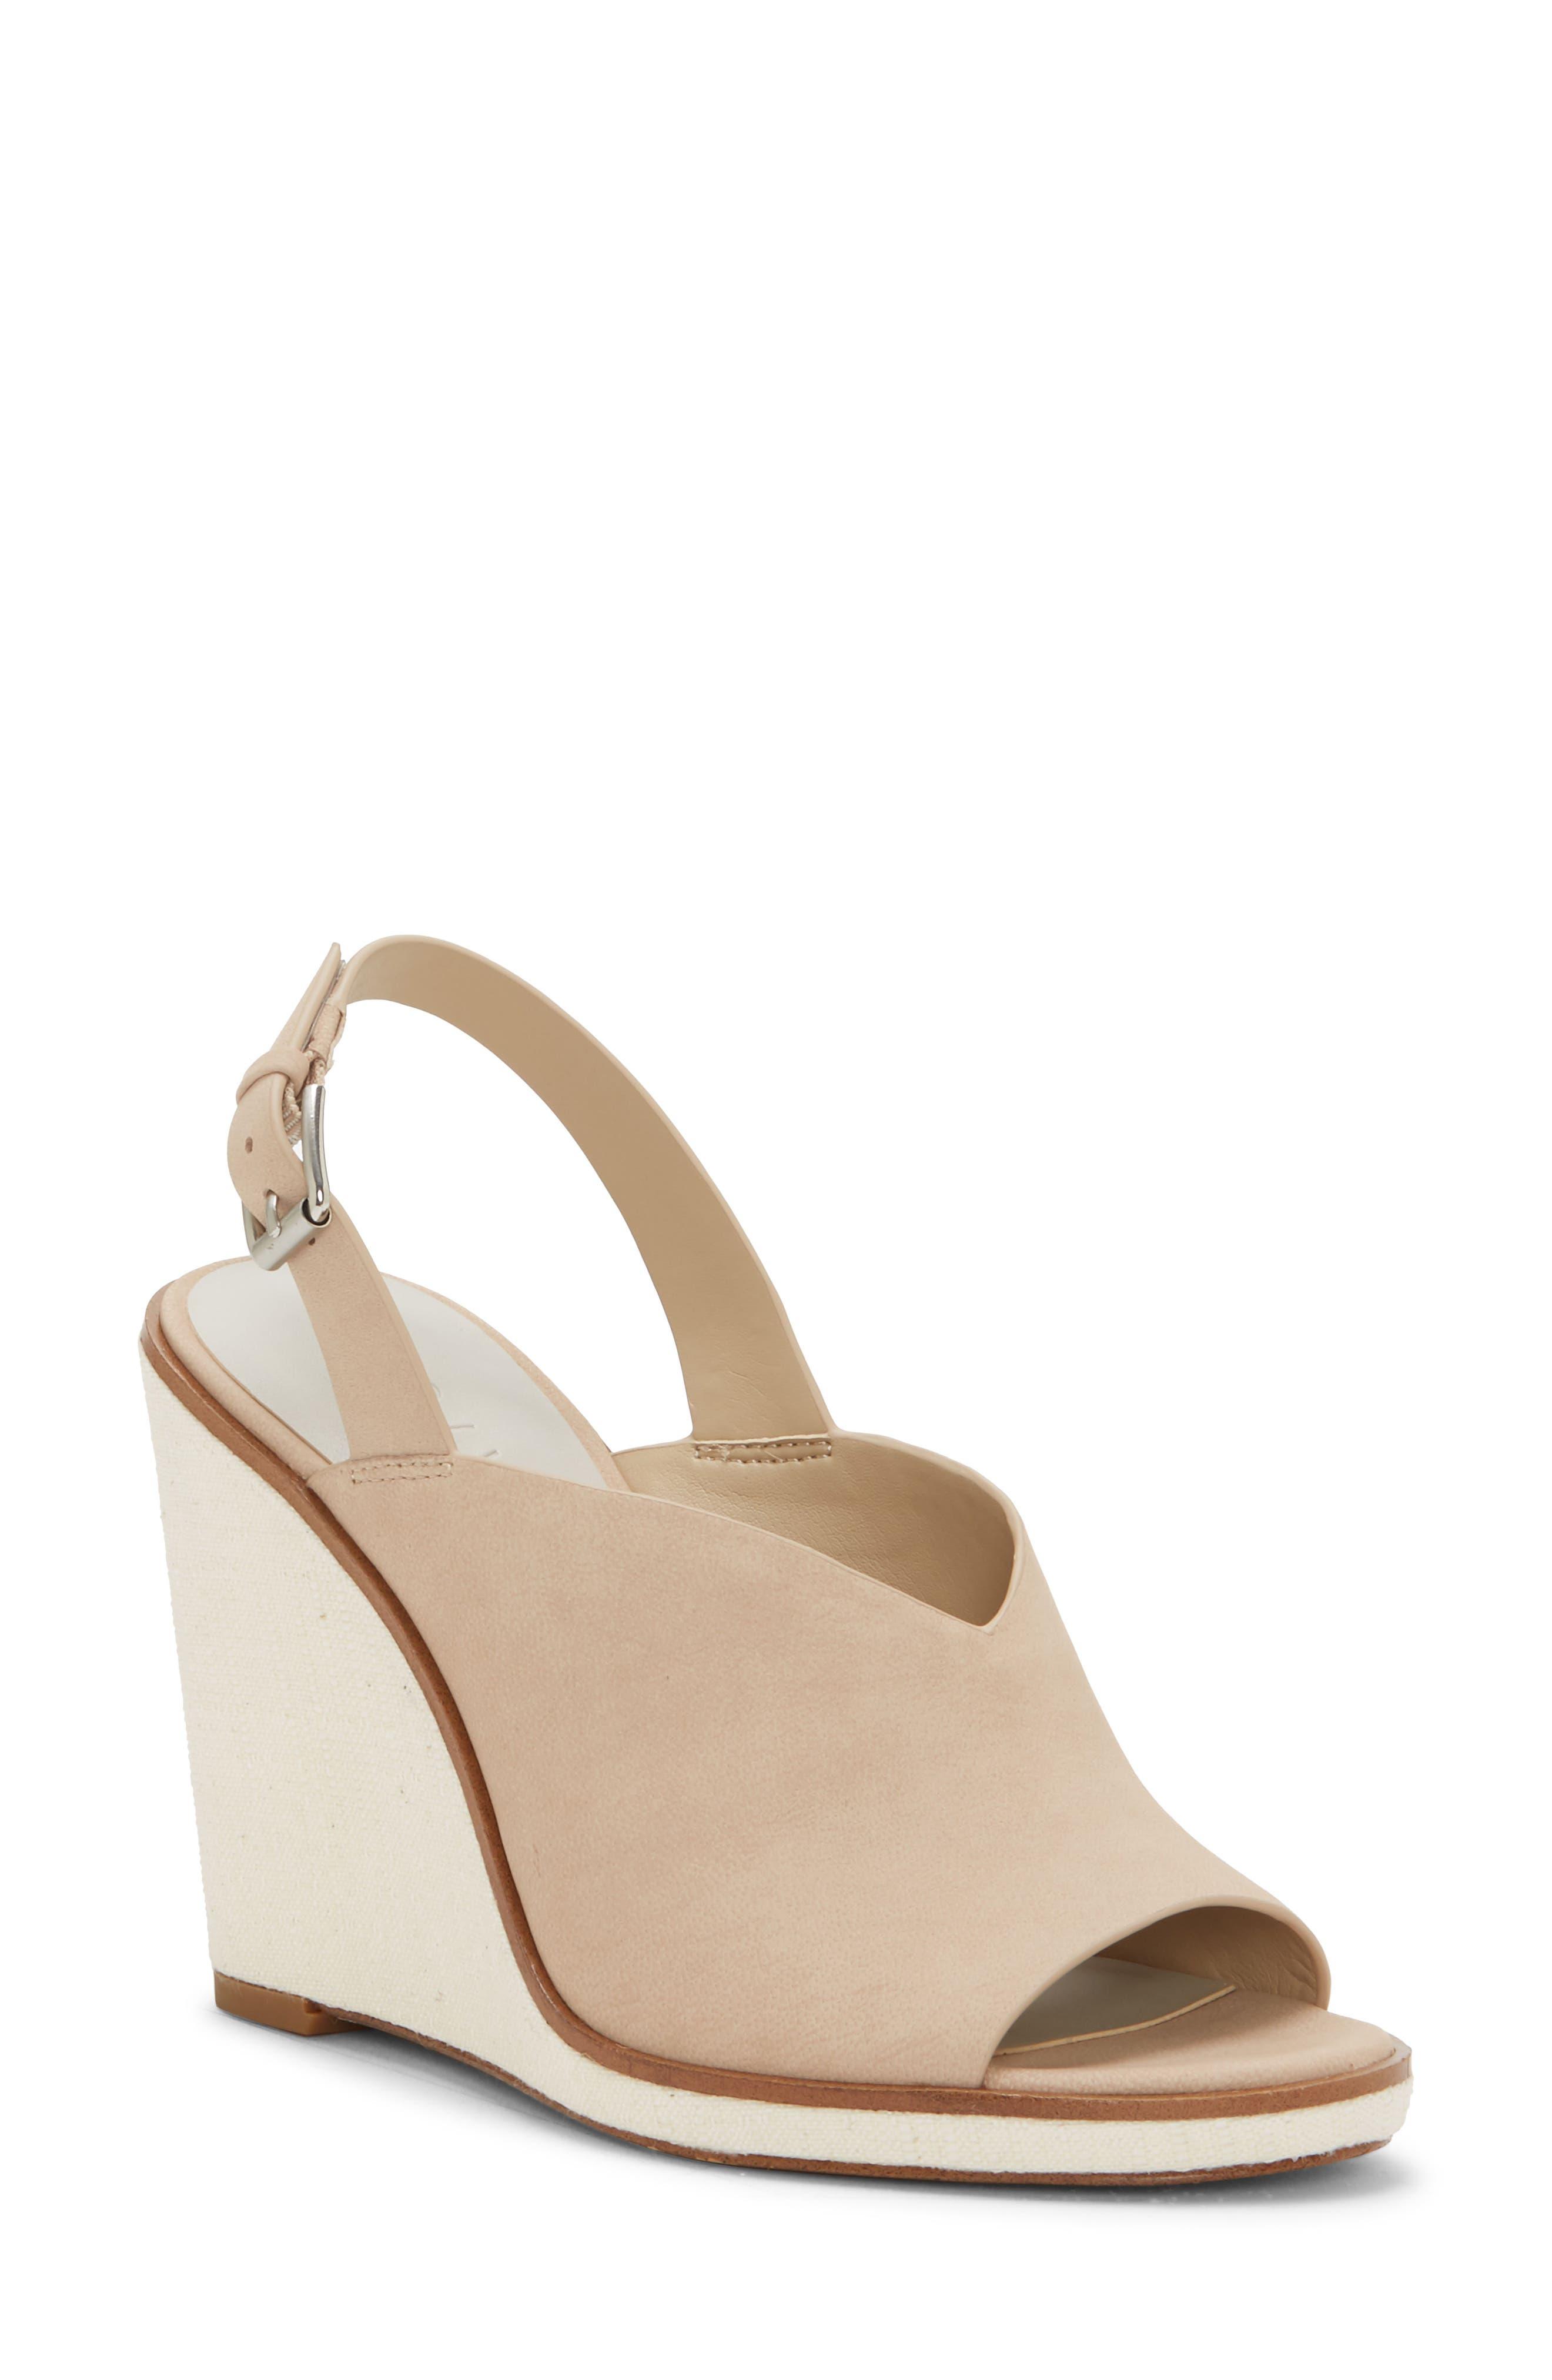 1.state Genna Wedge Sandal- Pink